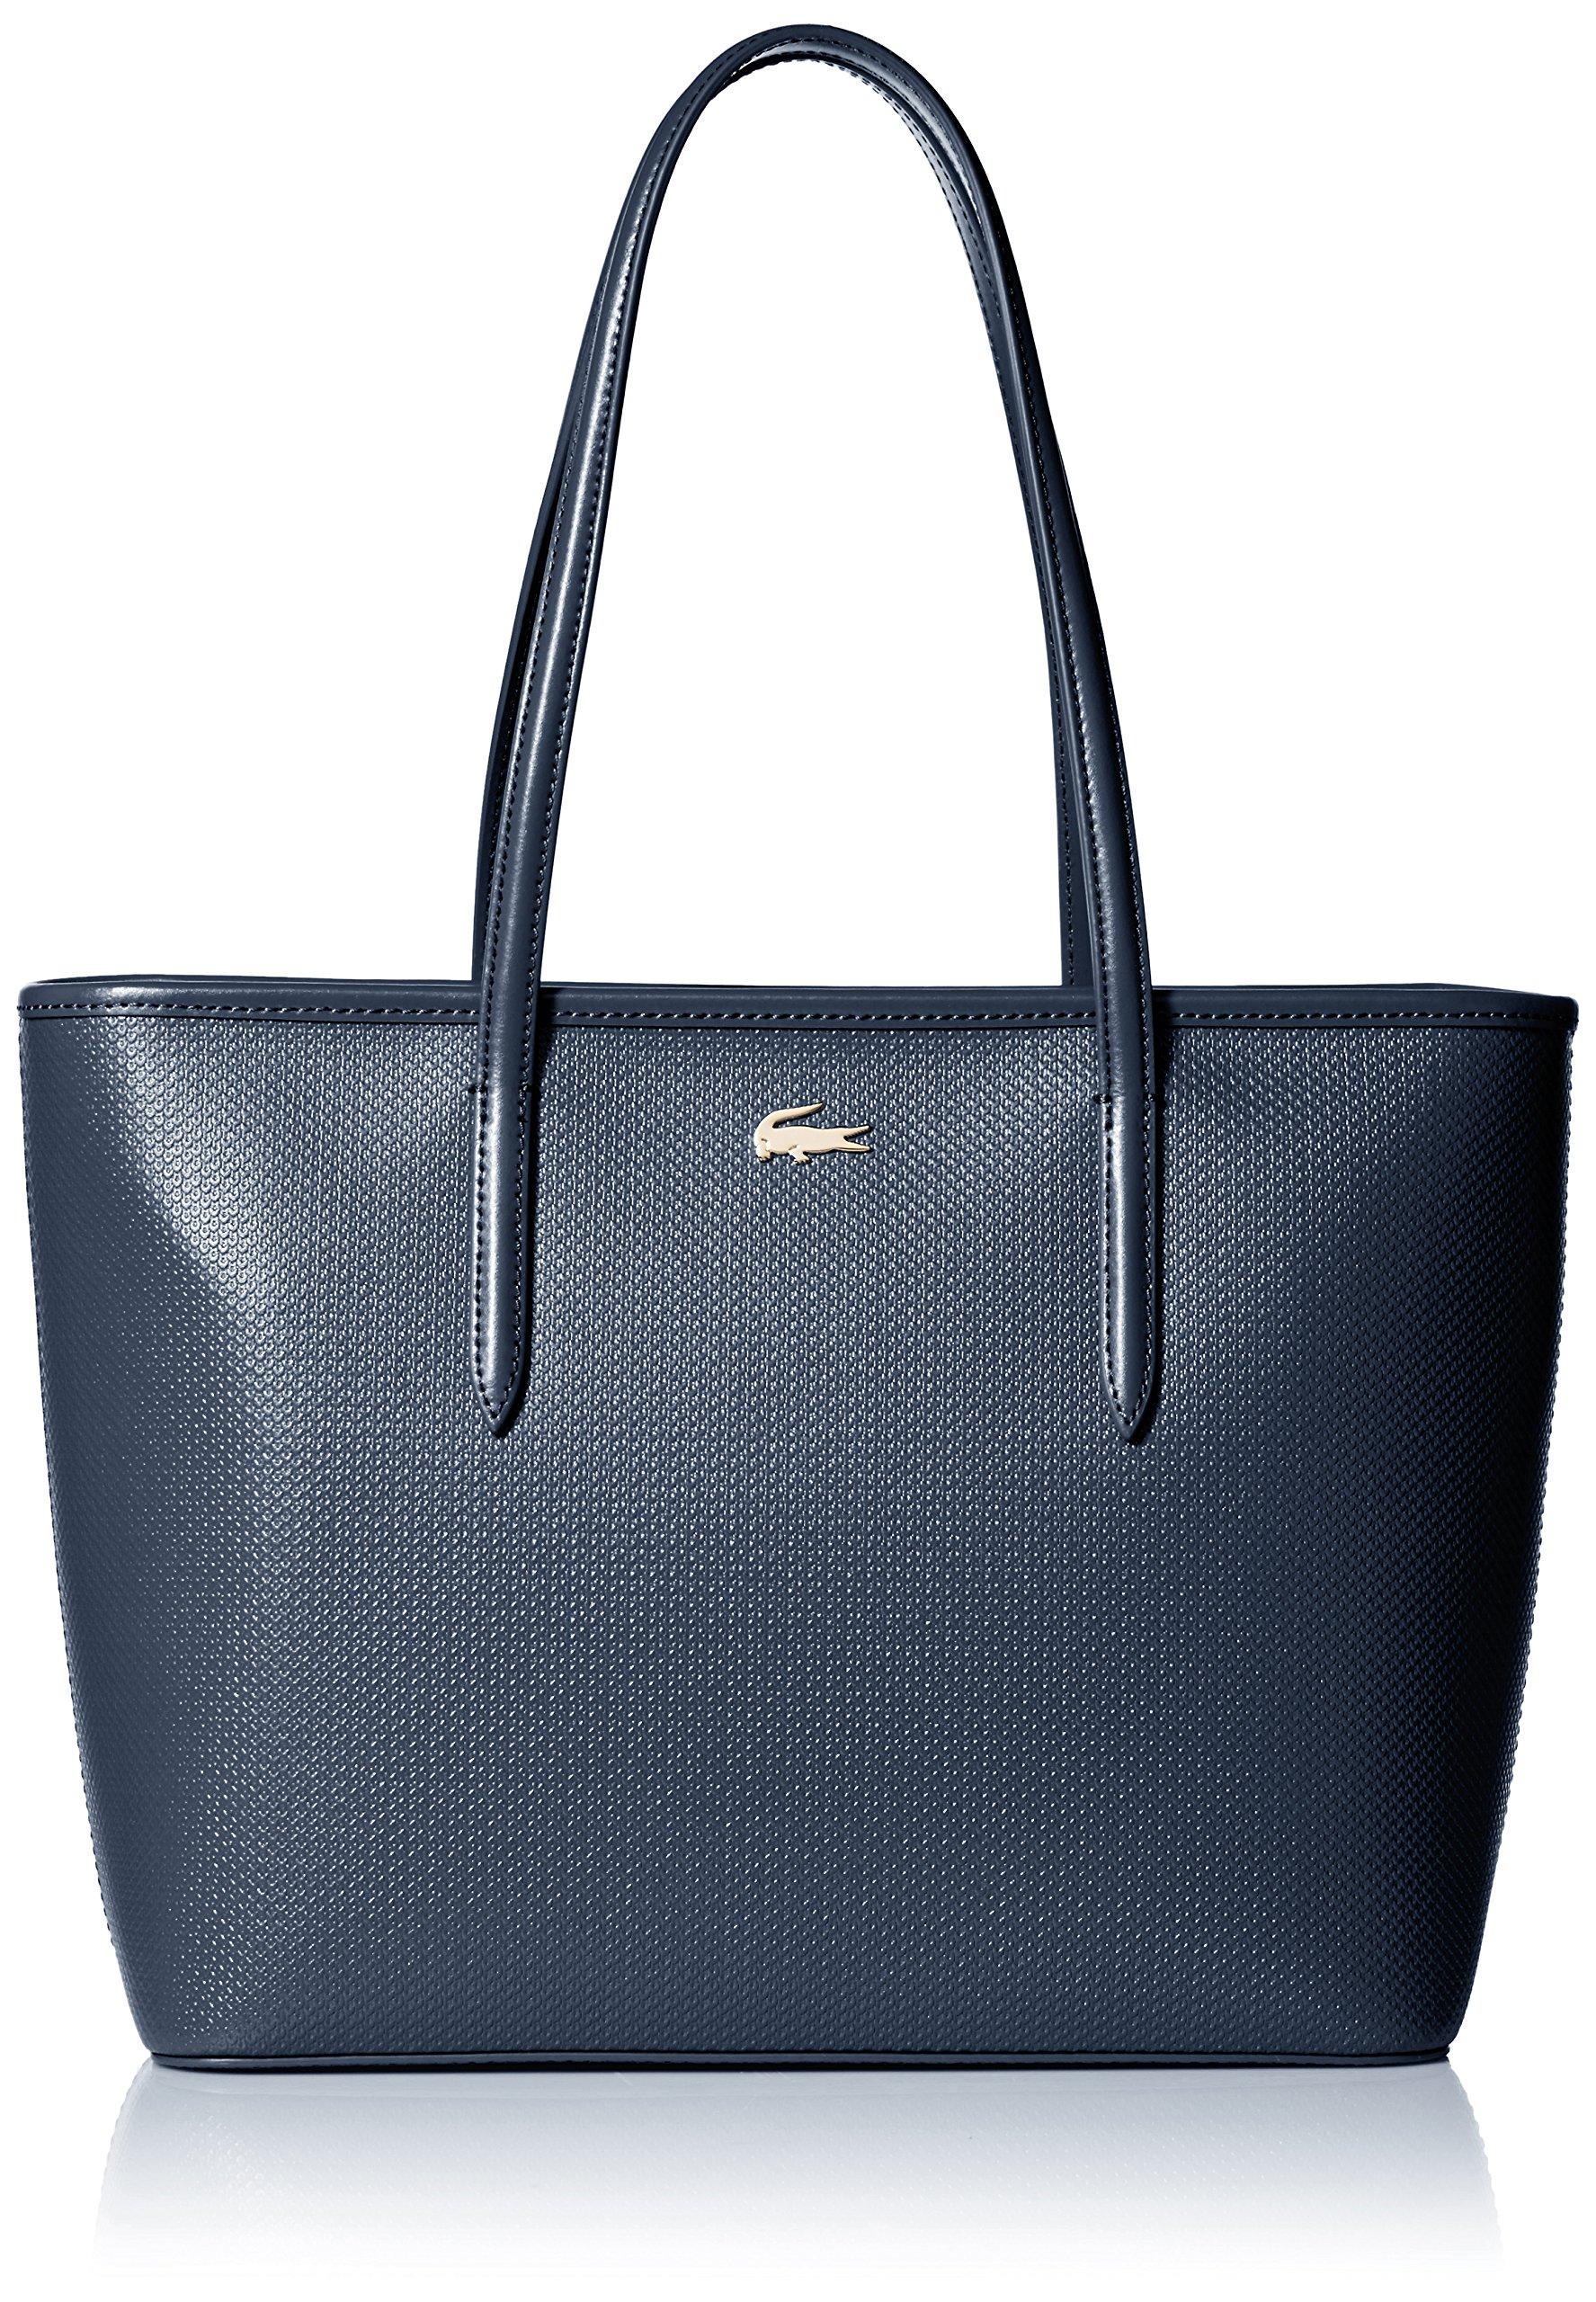 Lacoste Medium Zip Shopping Bag, Nf2116ce, Peacoat